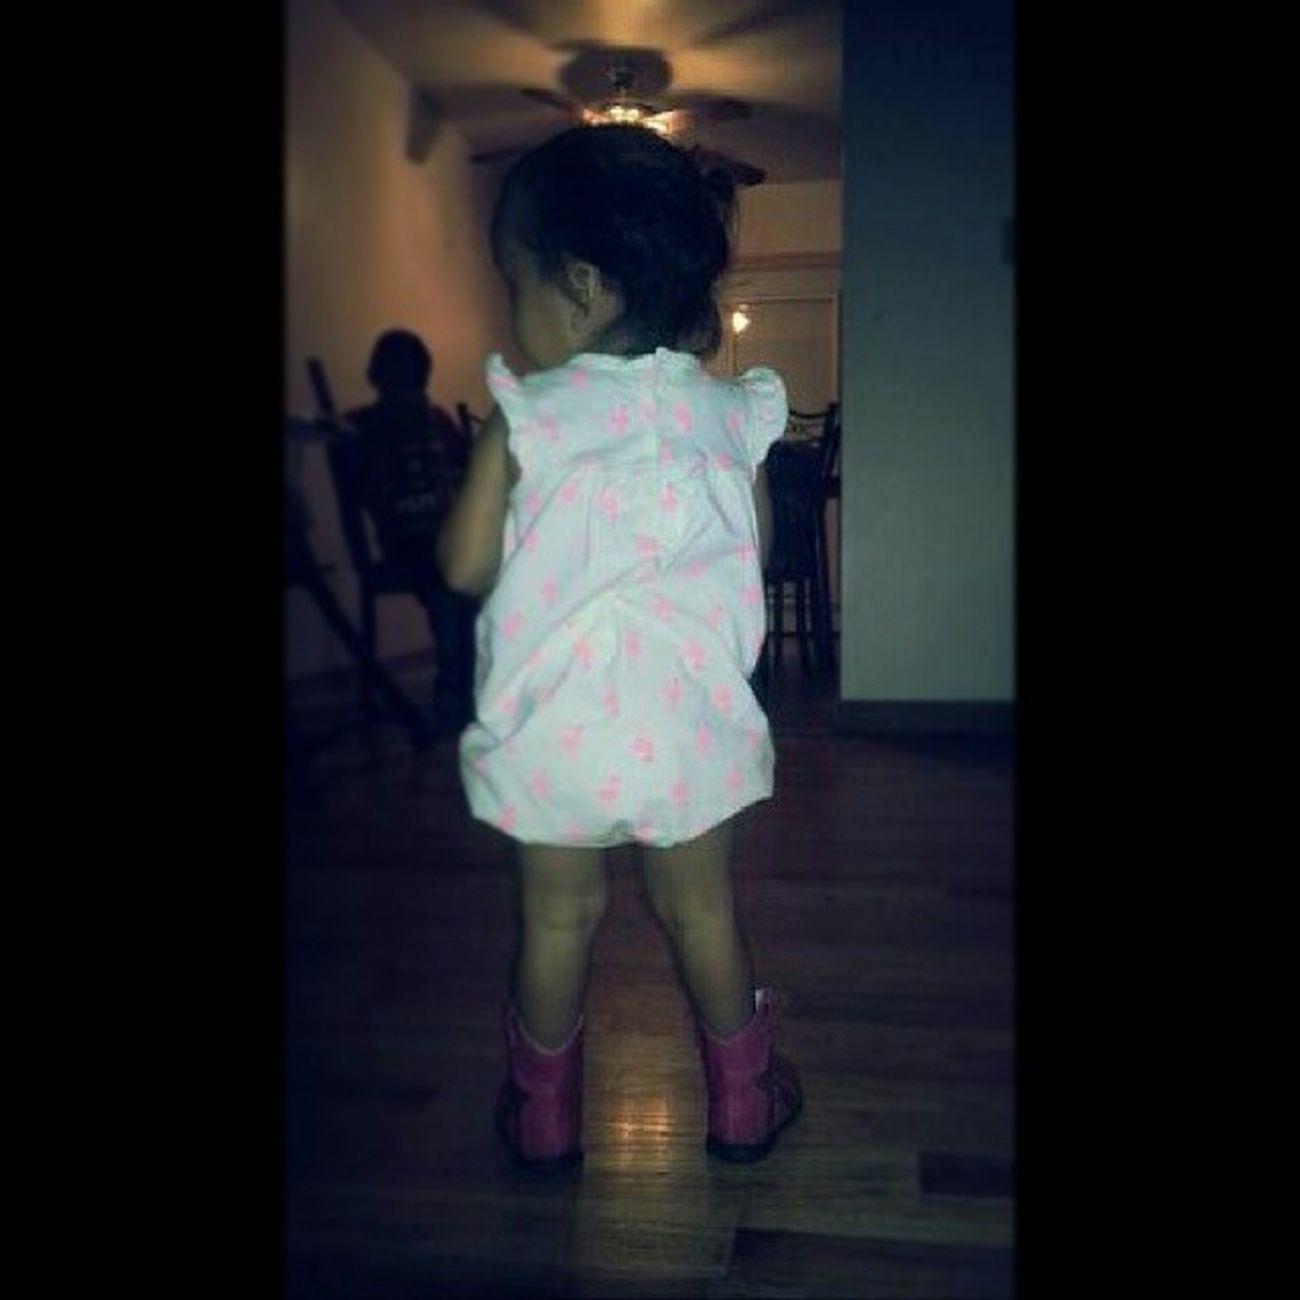 ZanaBana Babysitter Loveher Pinkboots